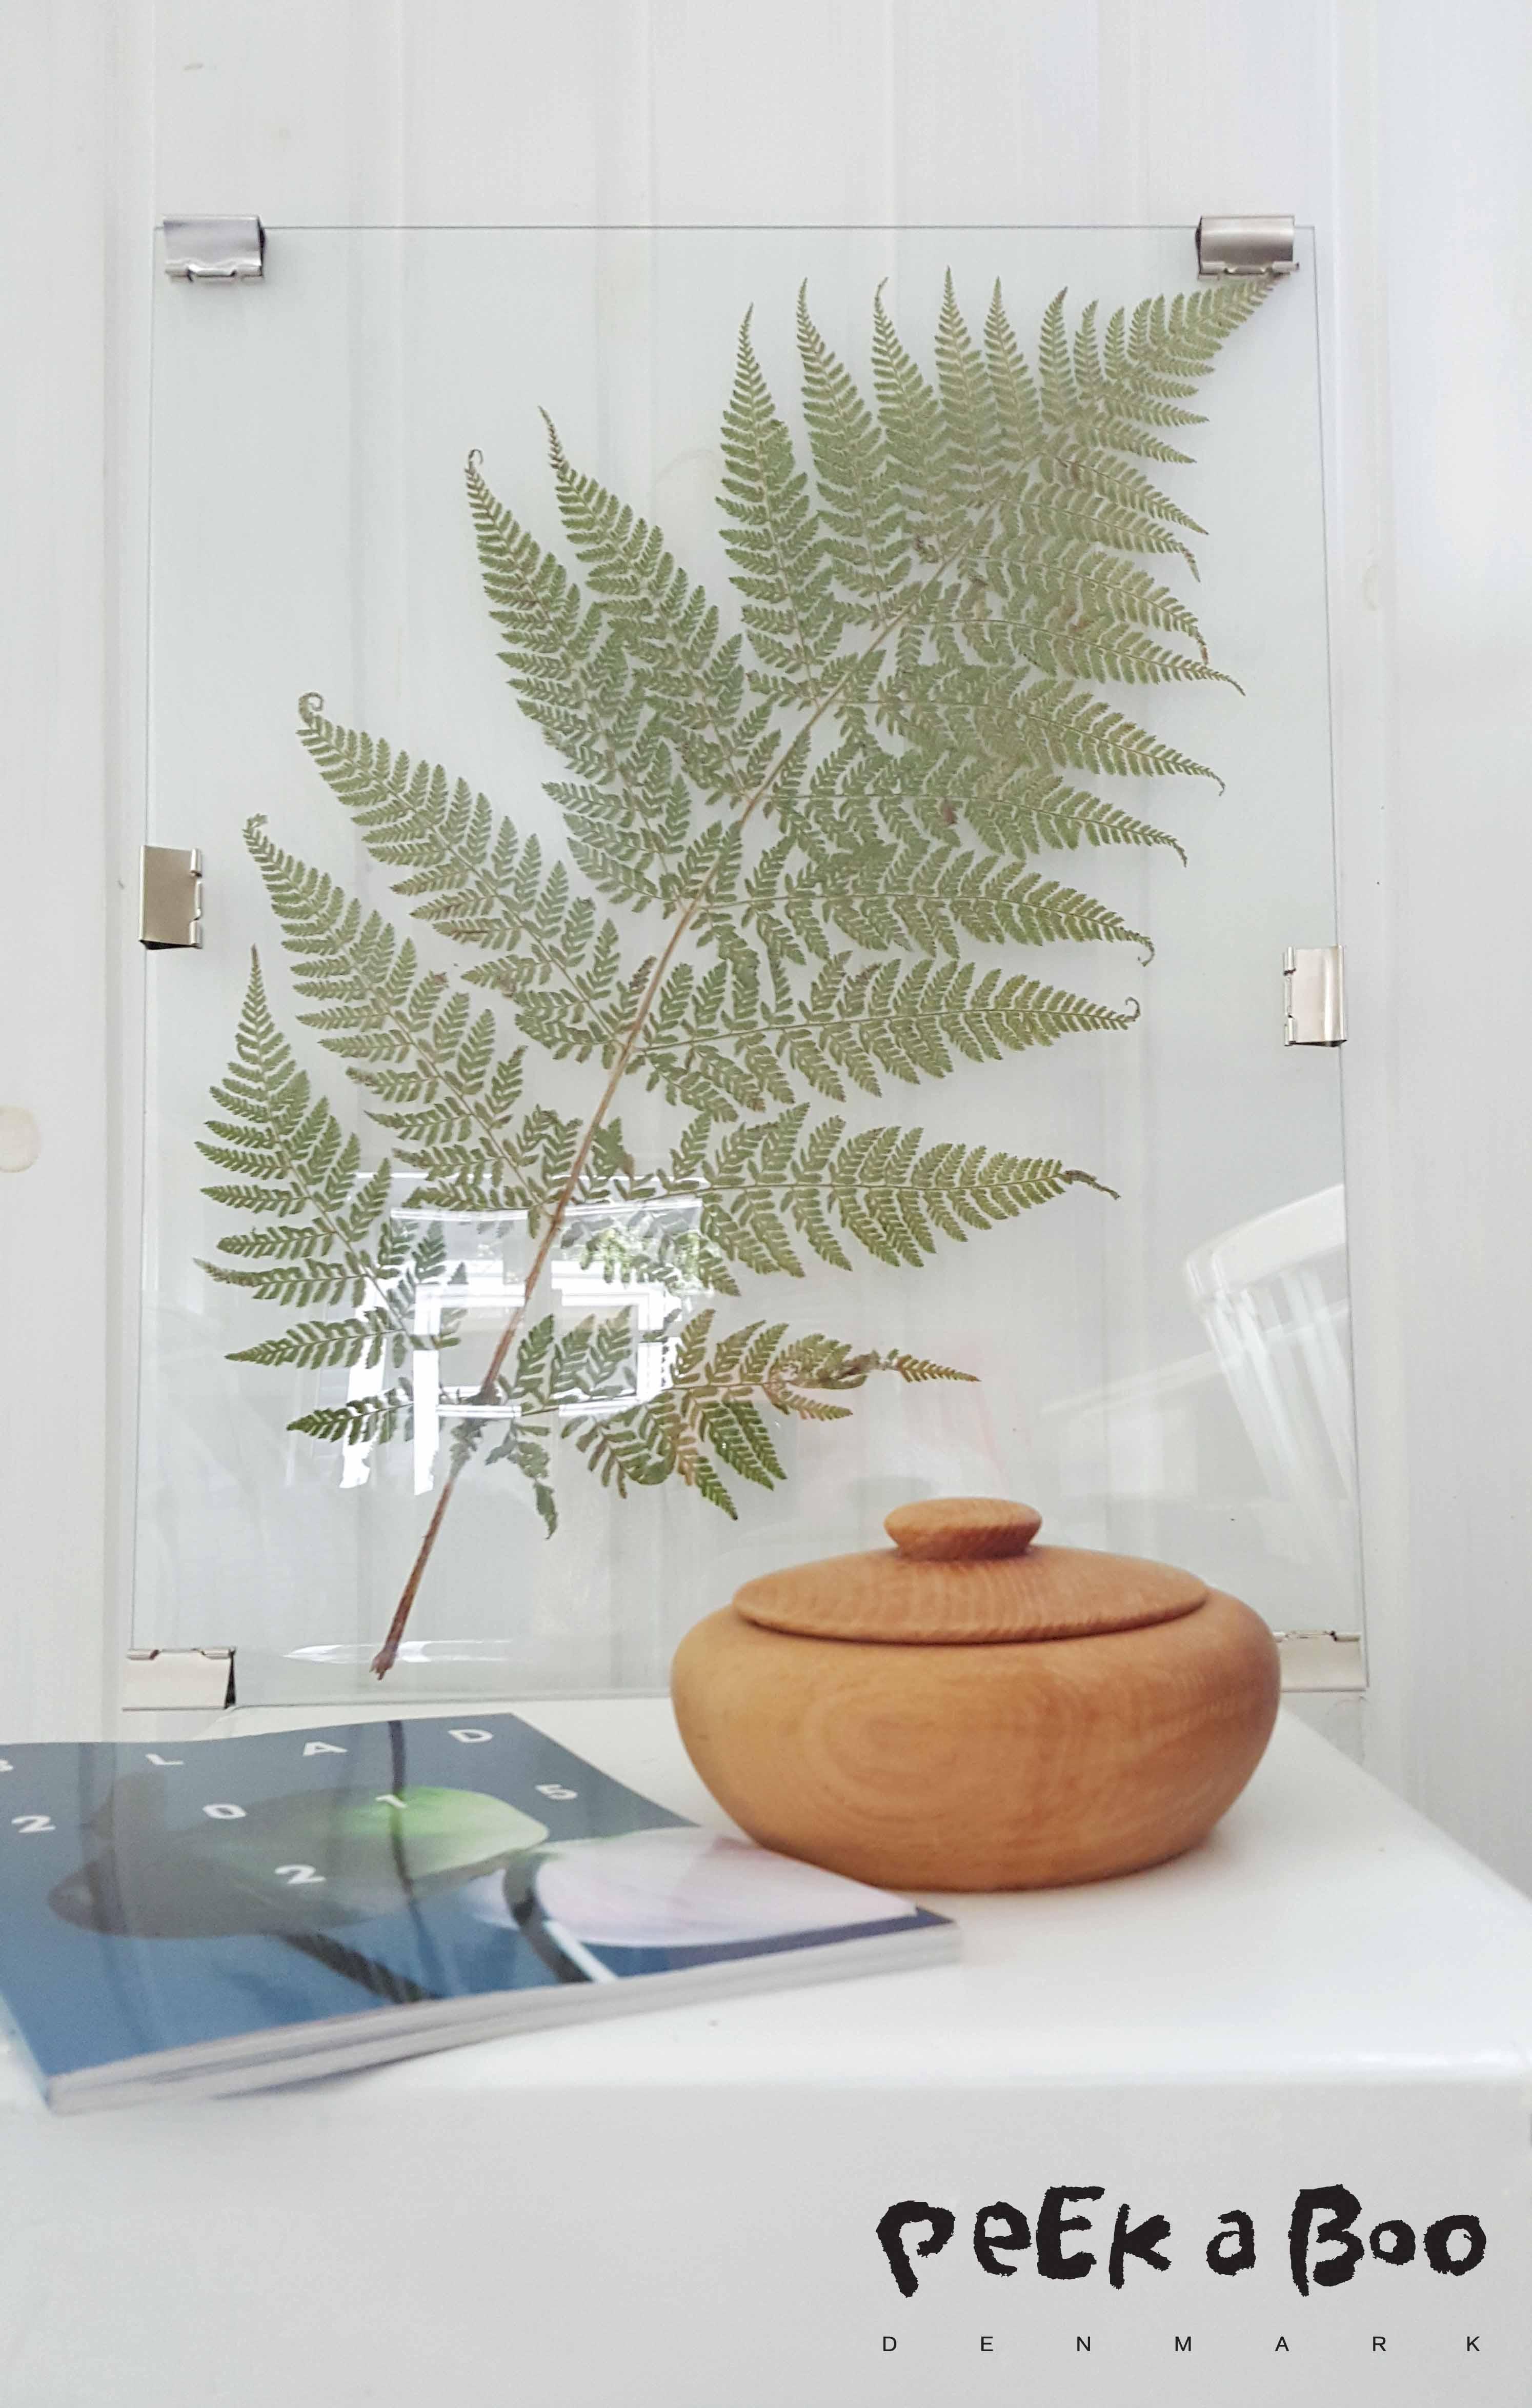 Transperant DIY frame with botanic elements.